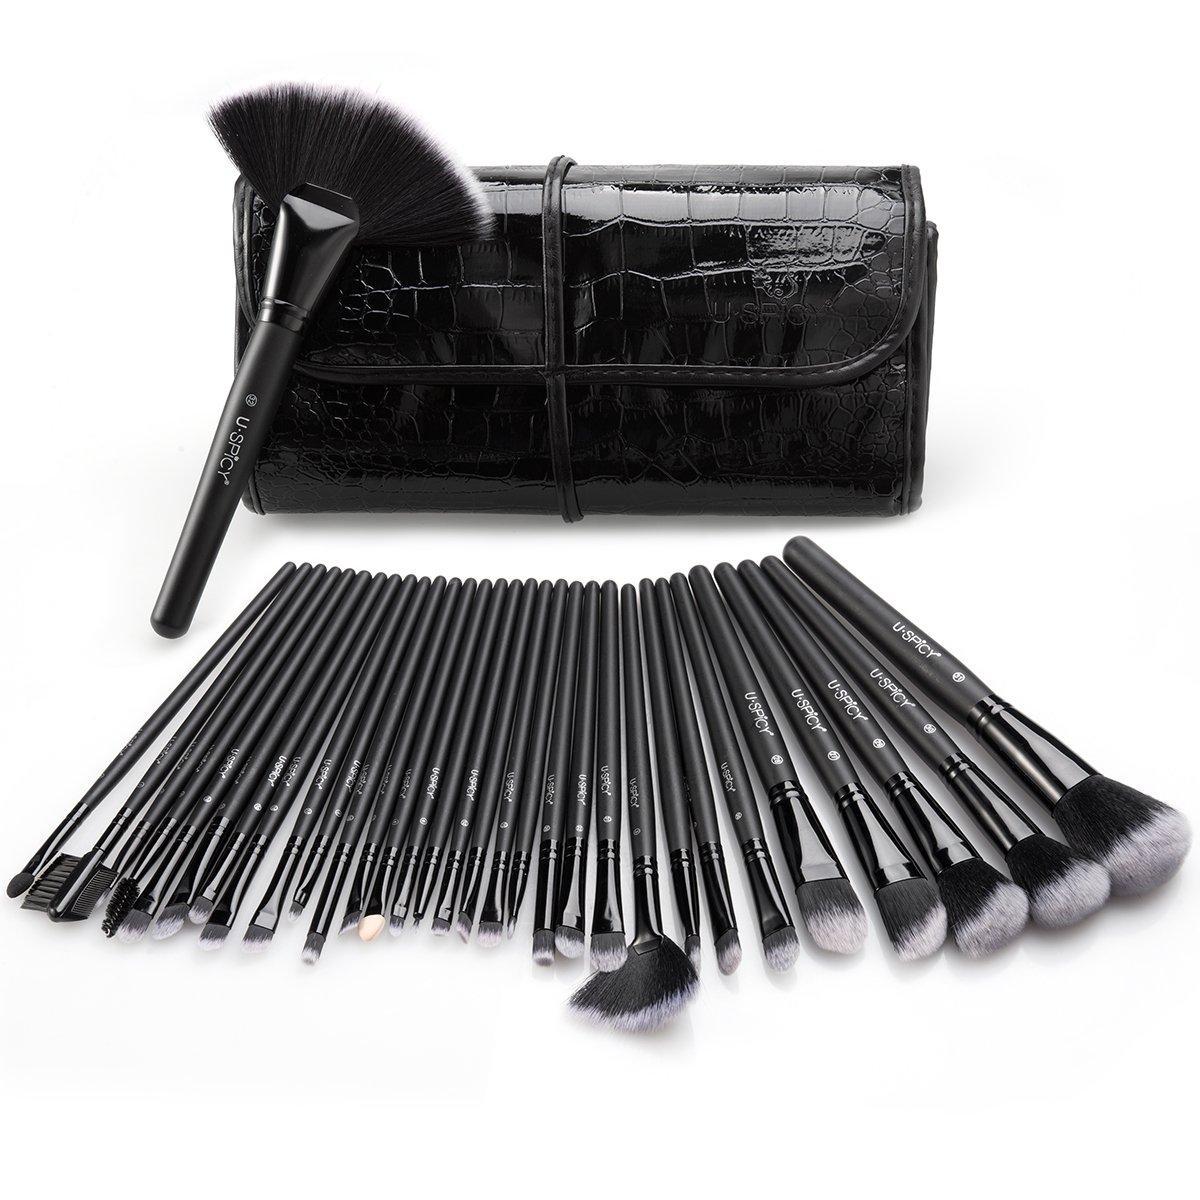 Naked3 Professional Makeup Brush Set - 32 Pcs